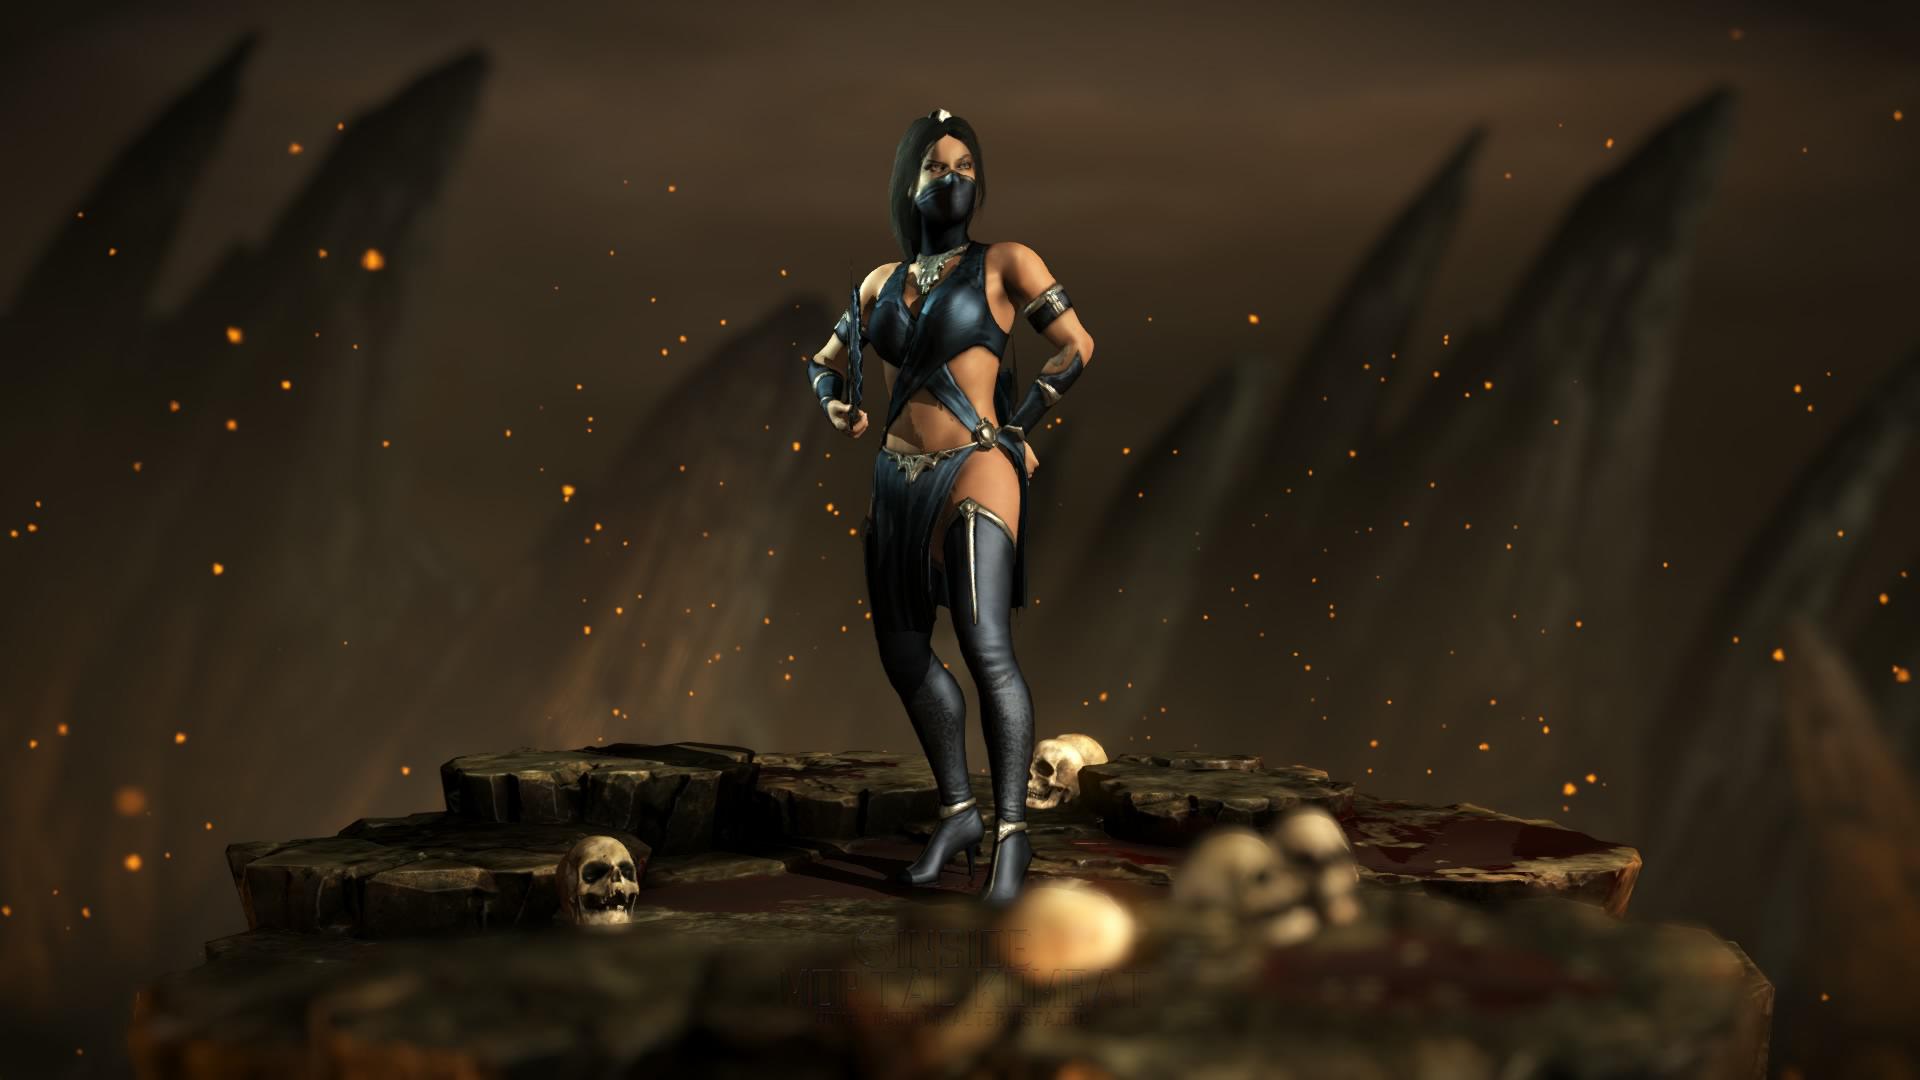 Mortal Kombat X Kitana Tournament 1 By Kebzuref On Deviantart